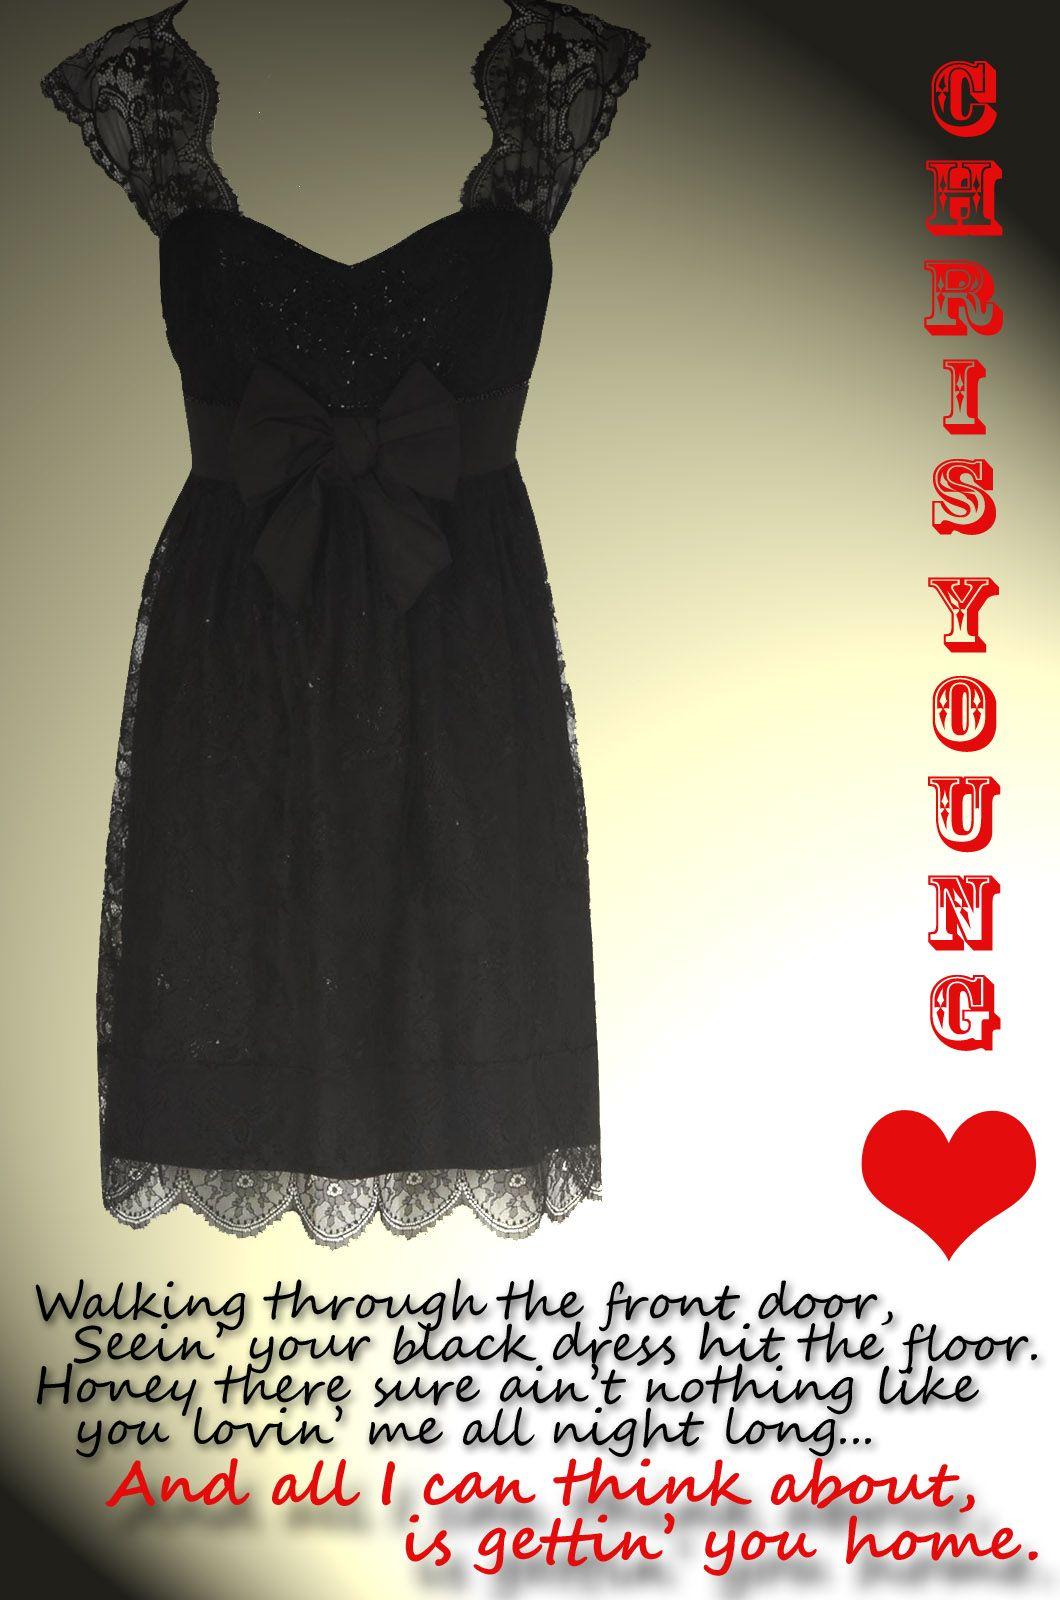 Long black dress by chris young